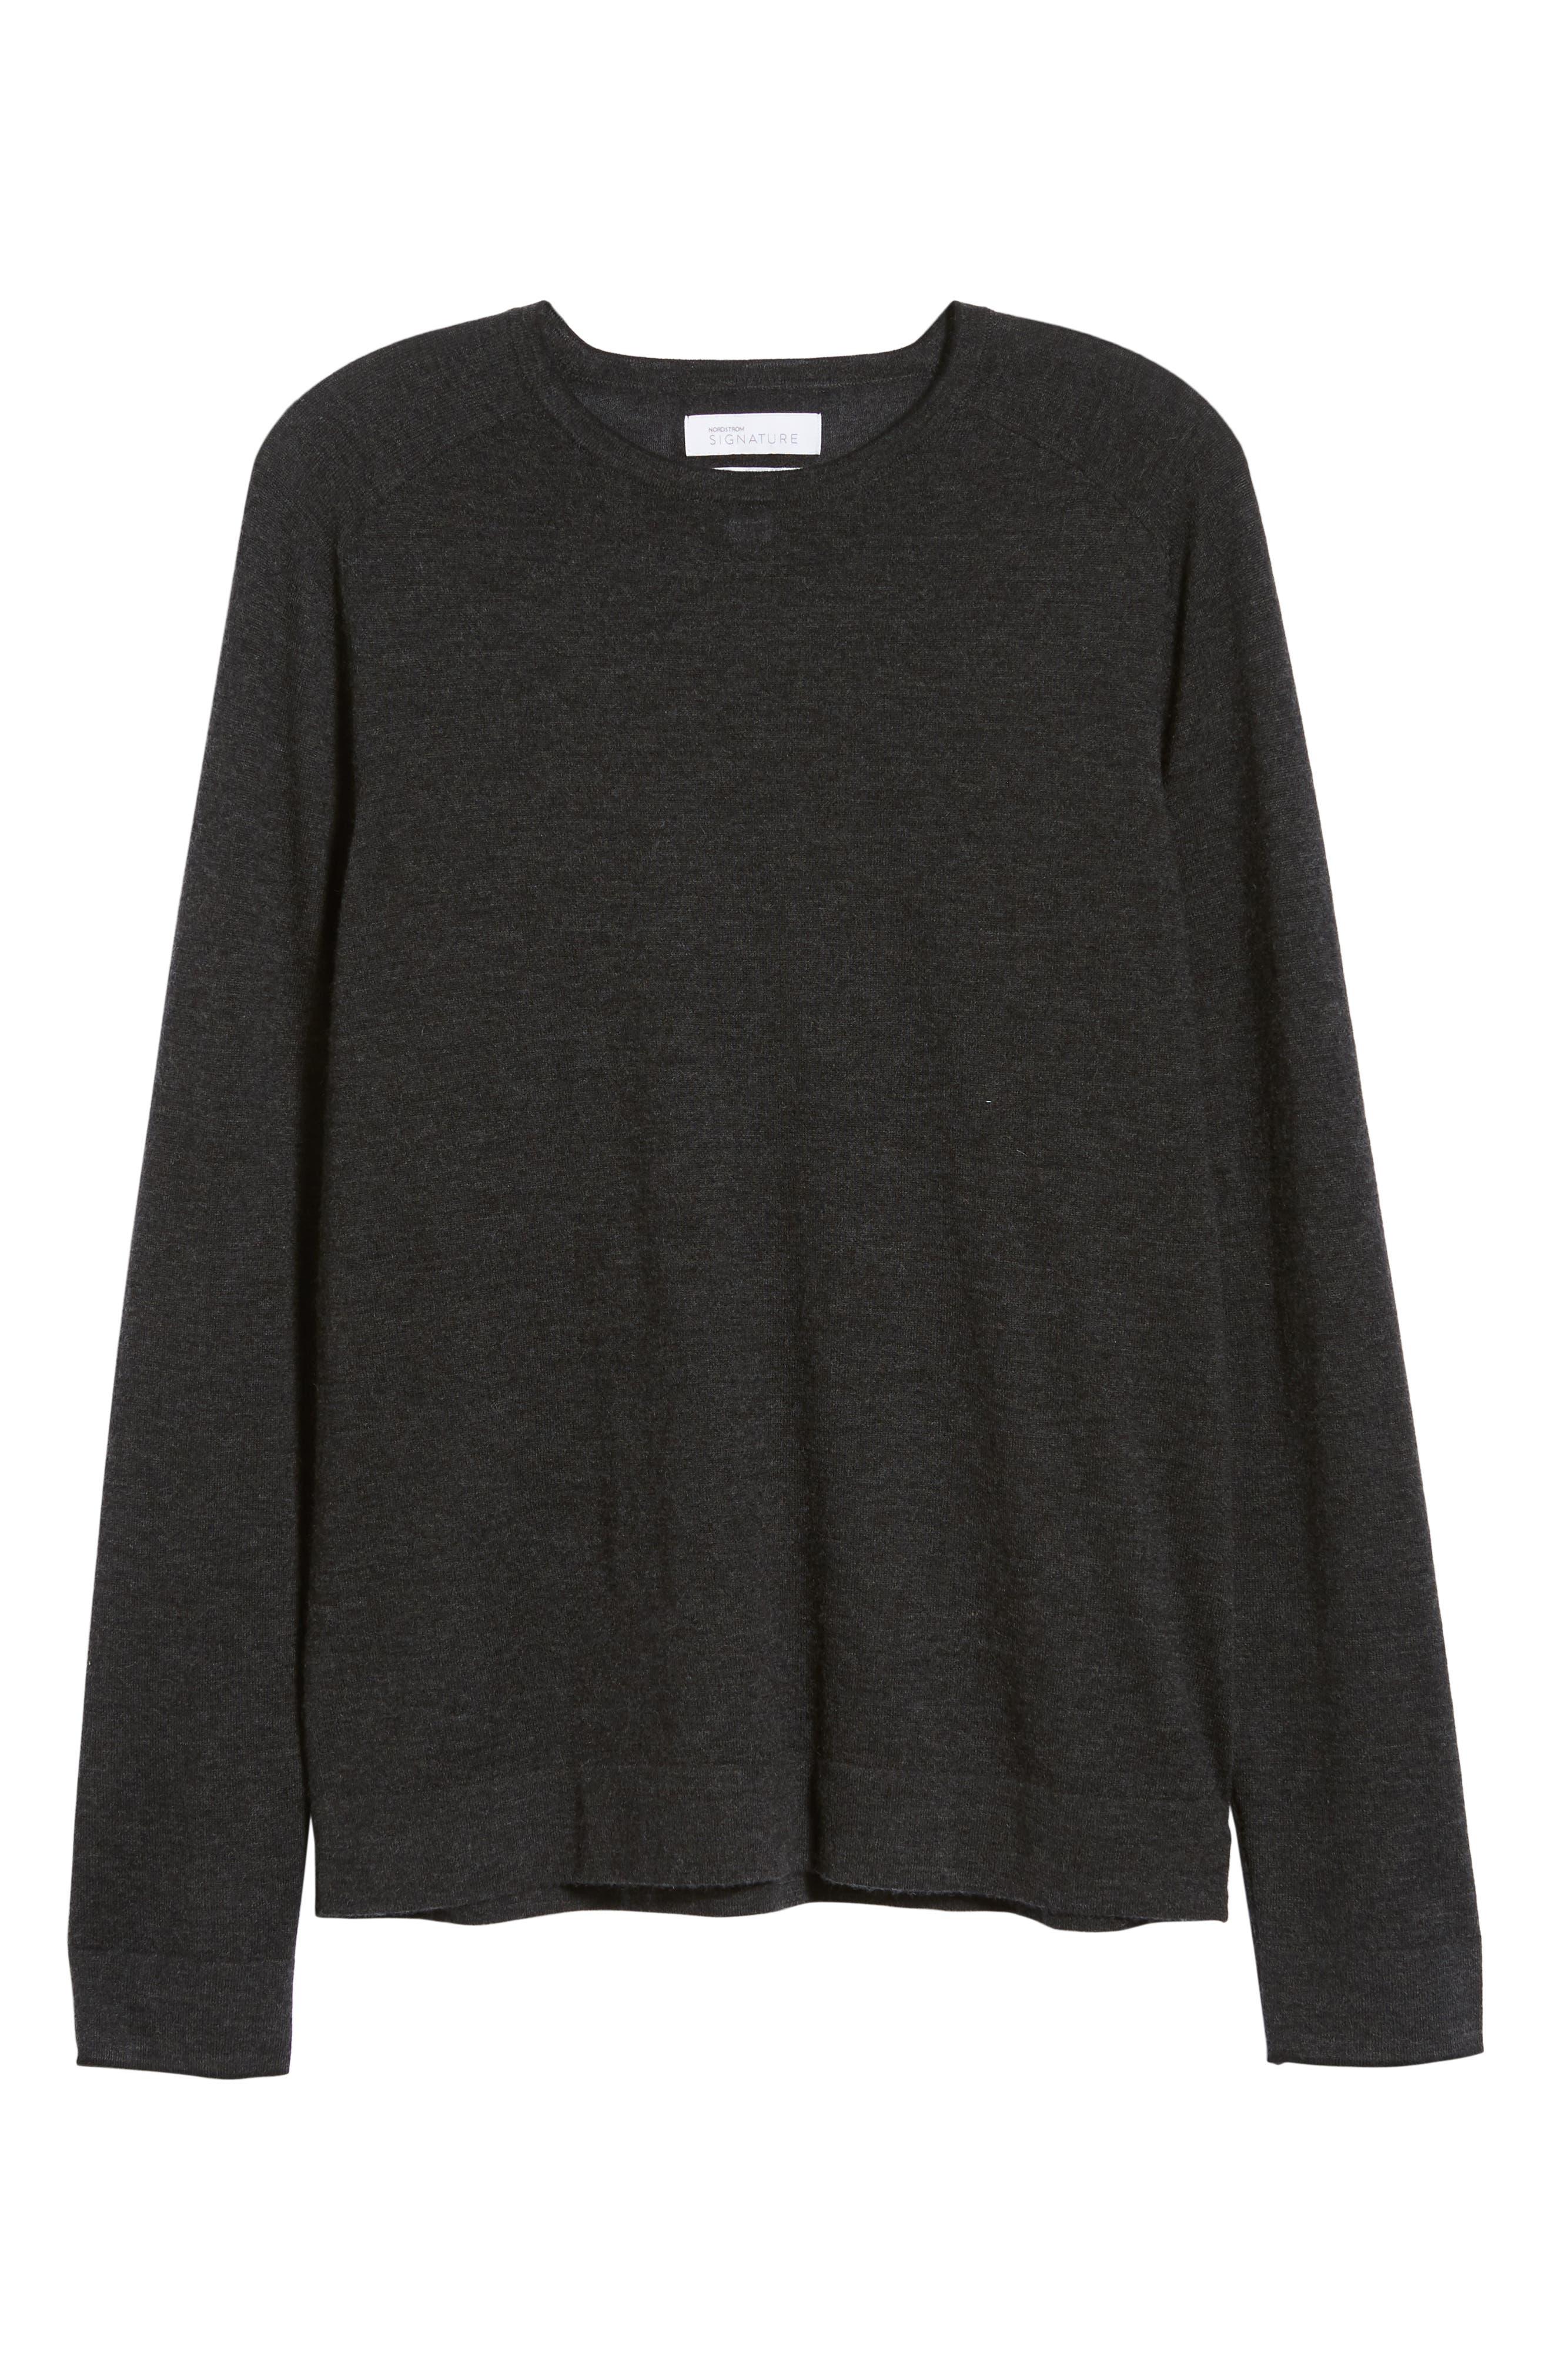 NORDSTROM SIGNATURE,                             Cashmere Crewneck Sweater,                             Alternate thumbnail 6, color,                             030